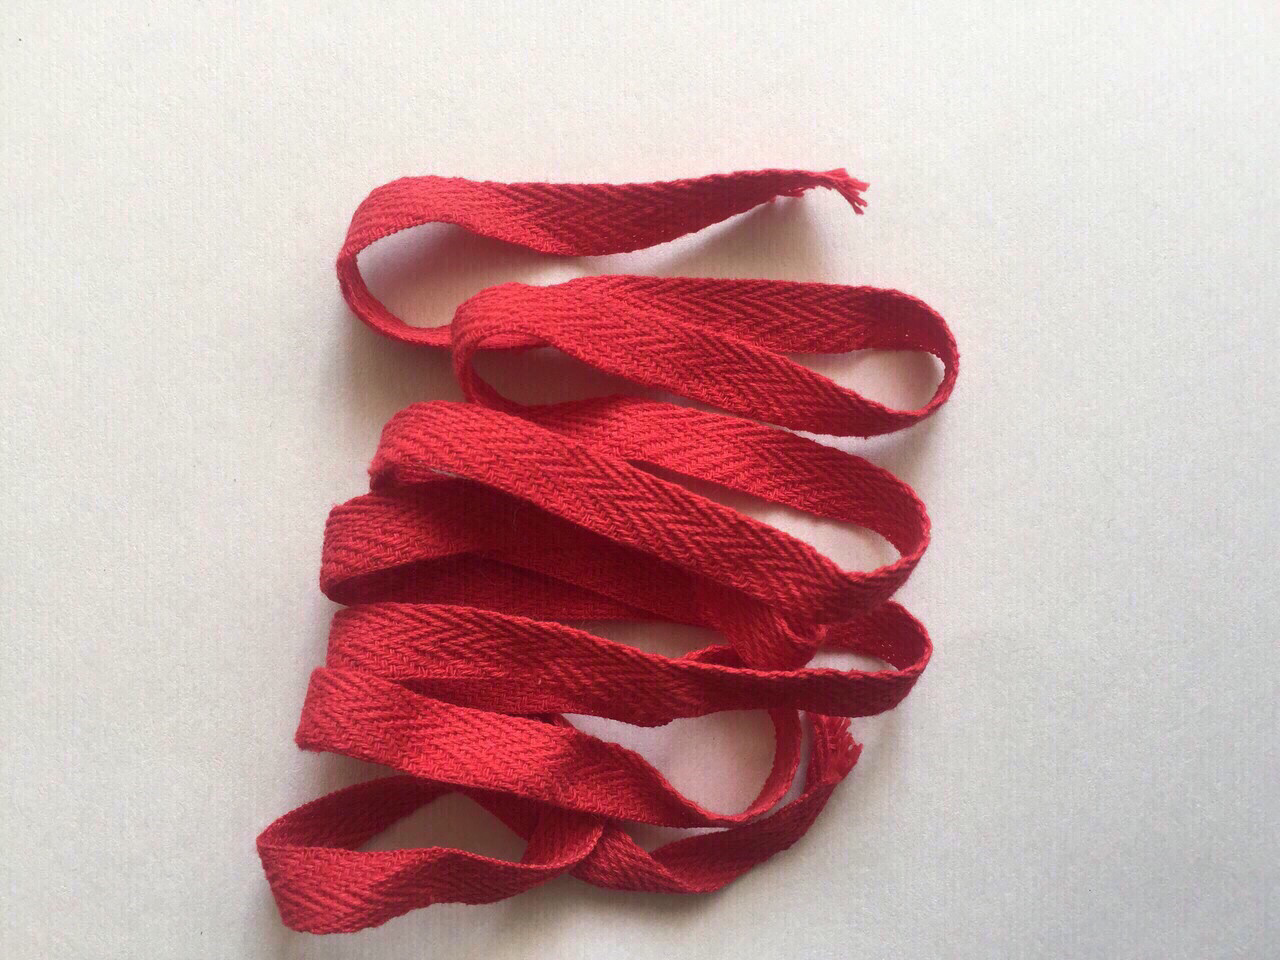 Киперна лента красная  10мм Хб 150м в бабине